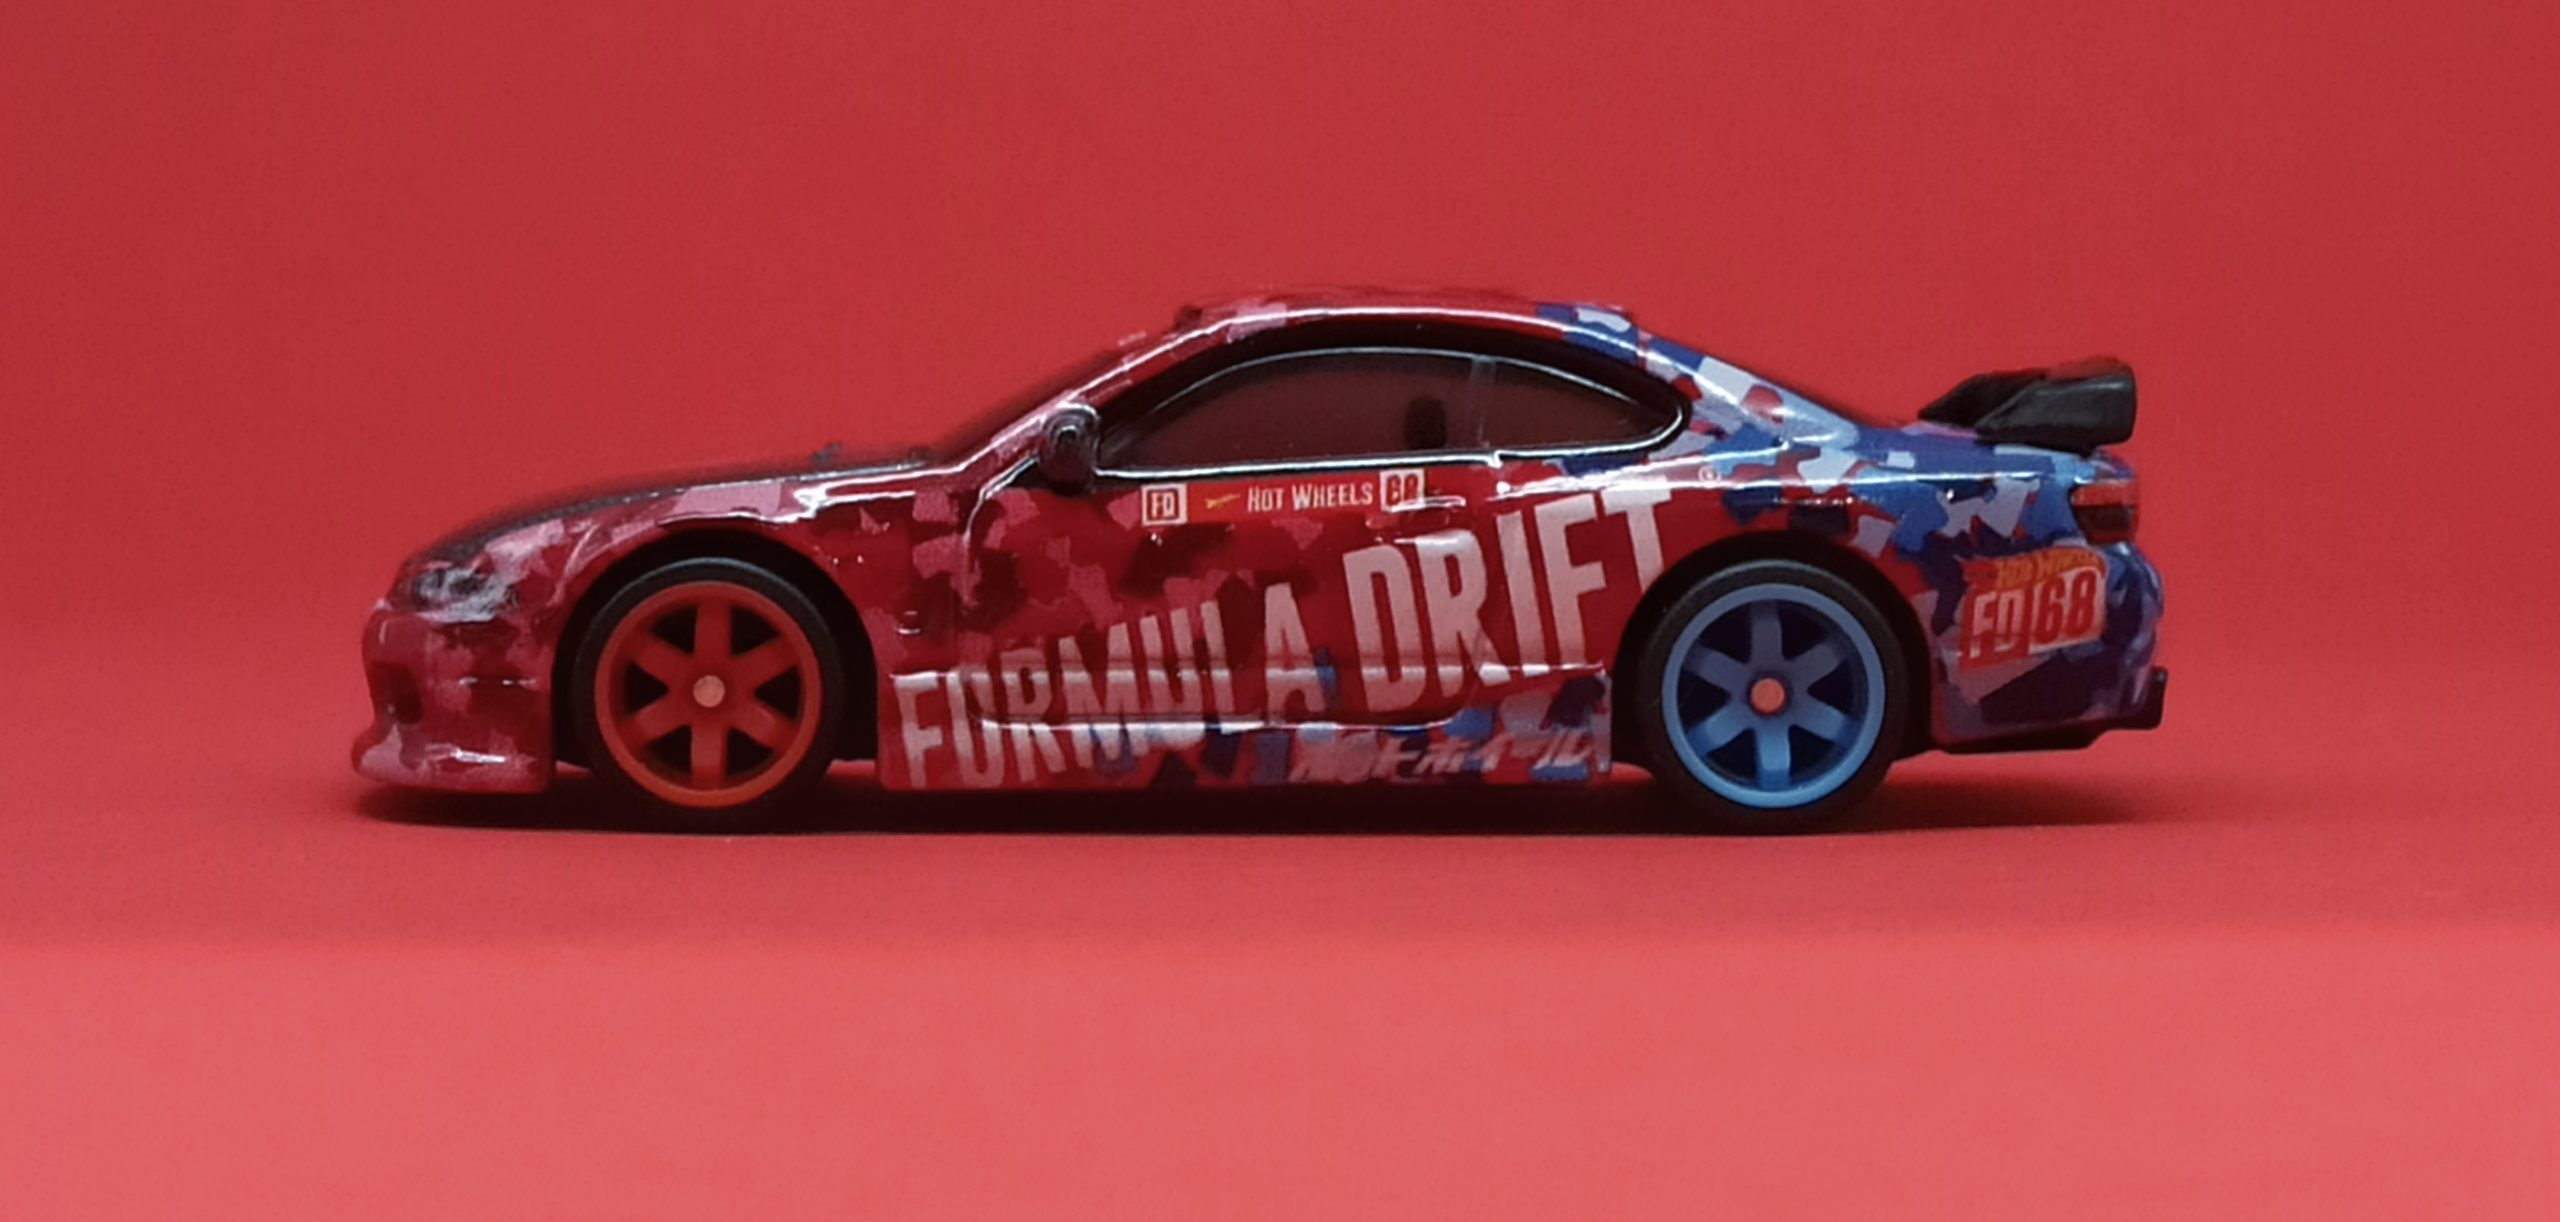 Hot Wheels Nissan Silvia S15 2018 model (GRB46) 2020 Hot Wheels Boulevard #7 Formula Drift red & blue side